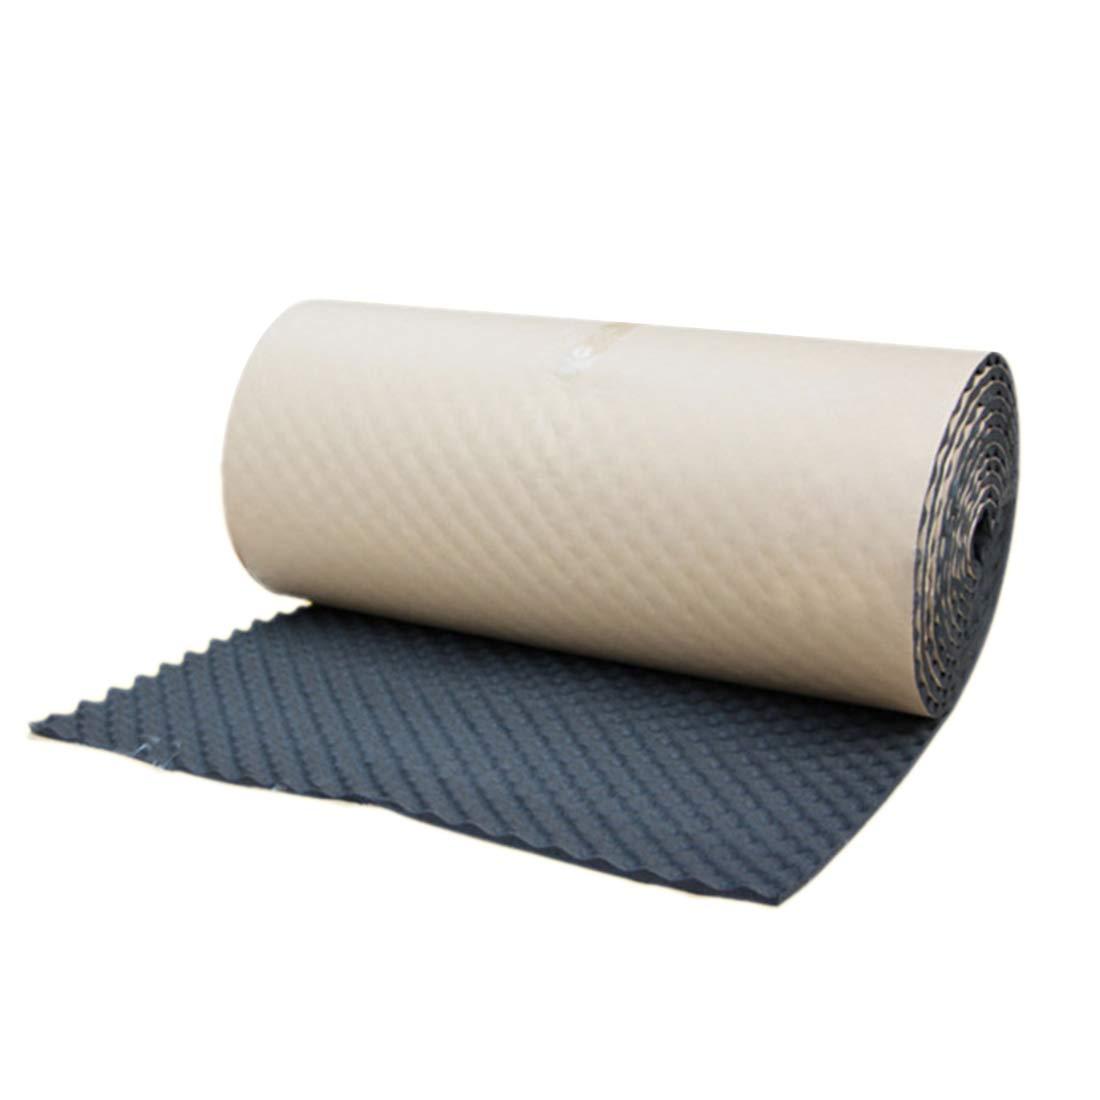 uxcell Studio Sound Acoustic Absorption Heatproof Foam Deadener 19.7''x39.4'' 5.4sqft